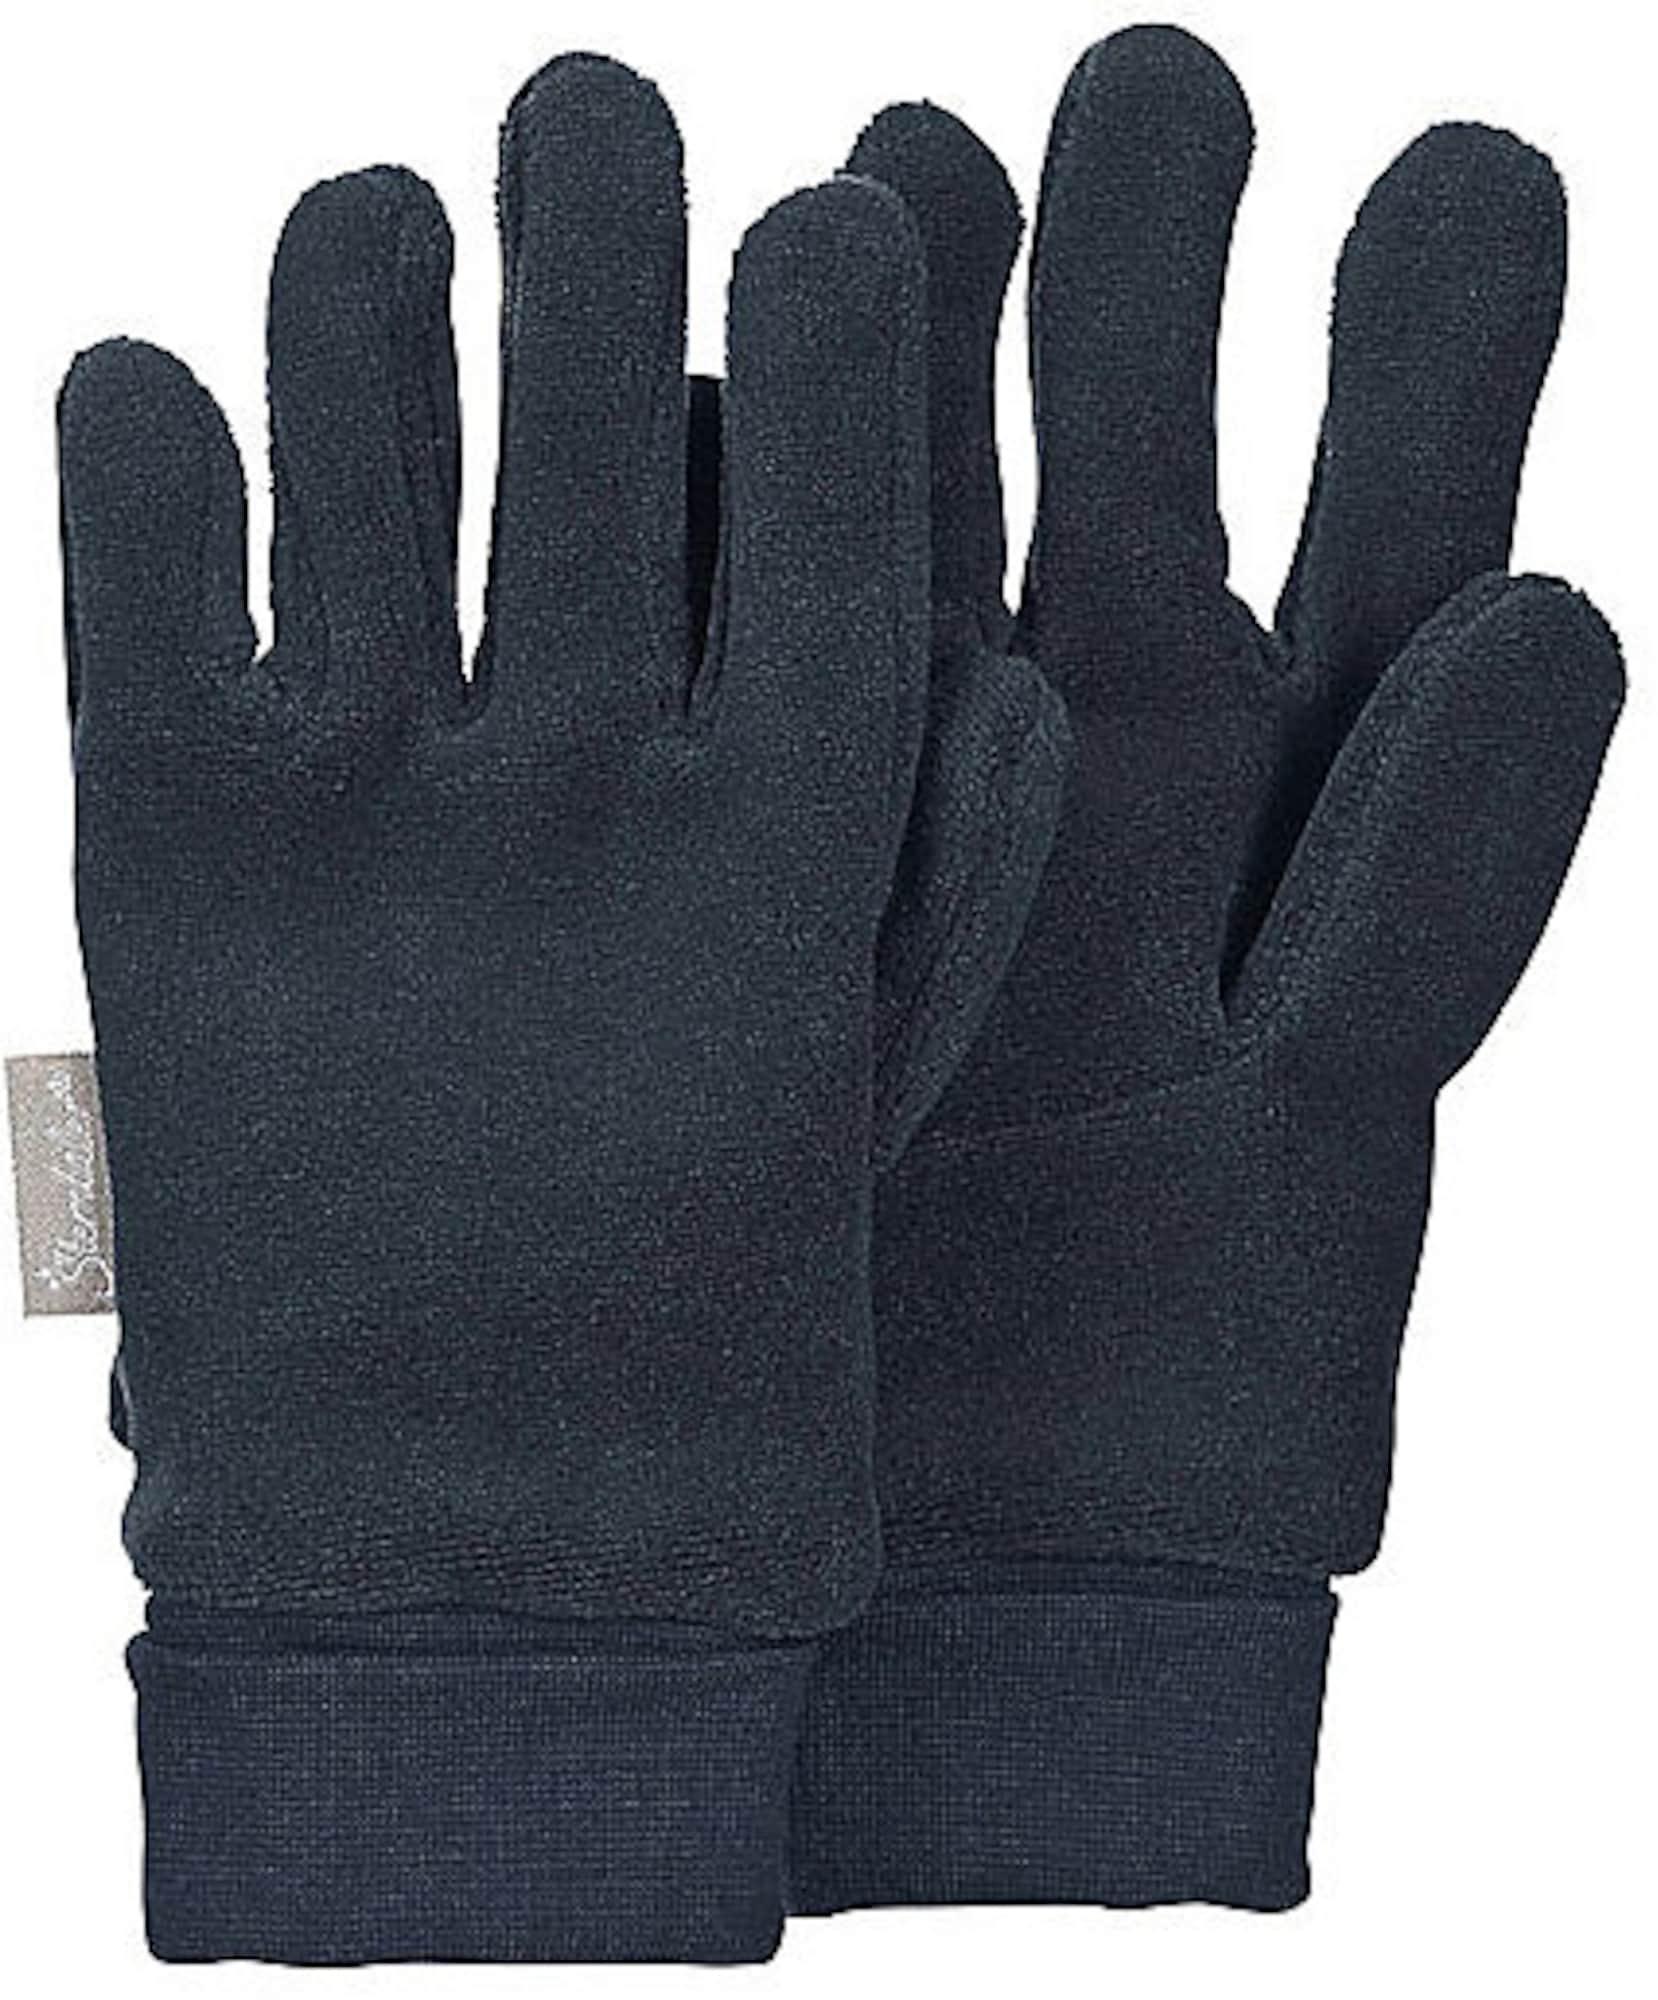 Babyaccessoires - Handschuhe - Onlineshop ABOUT YOU